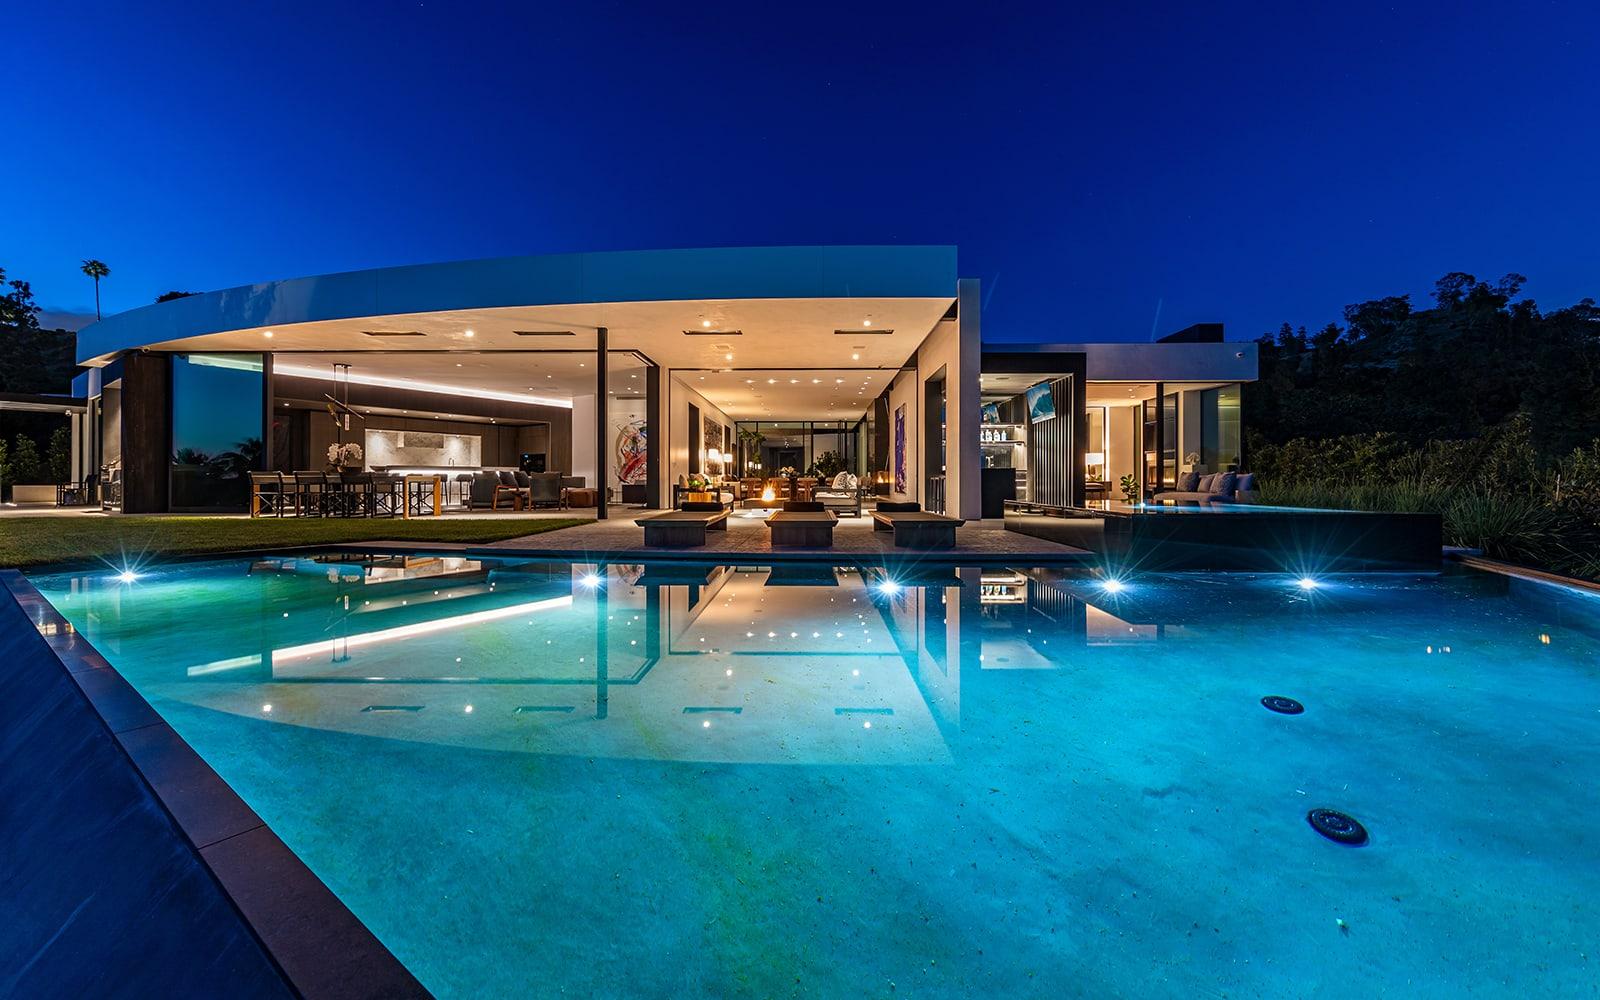 swimming pool nightime beverly hills luxury home